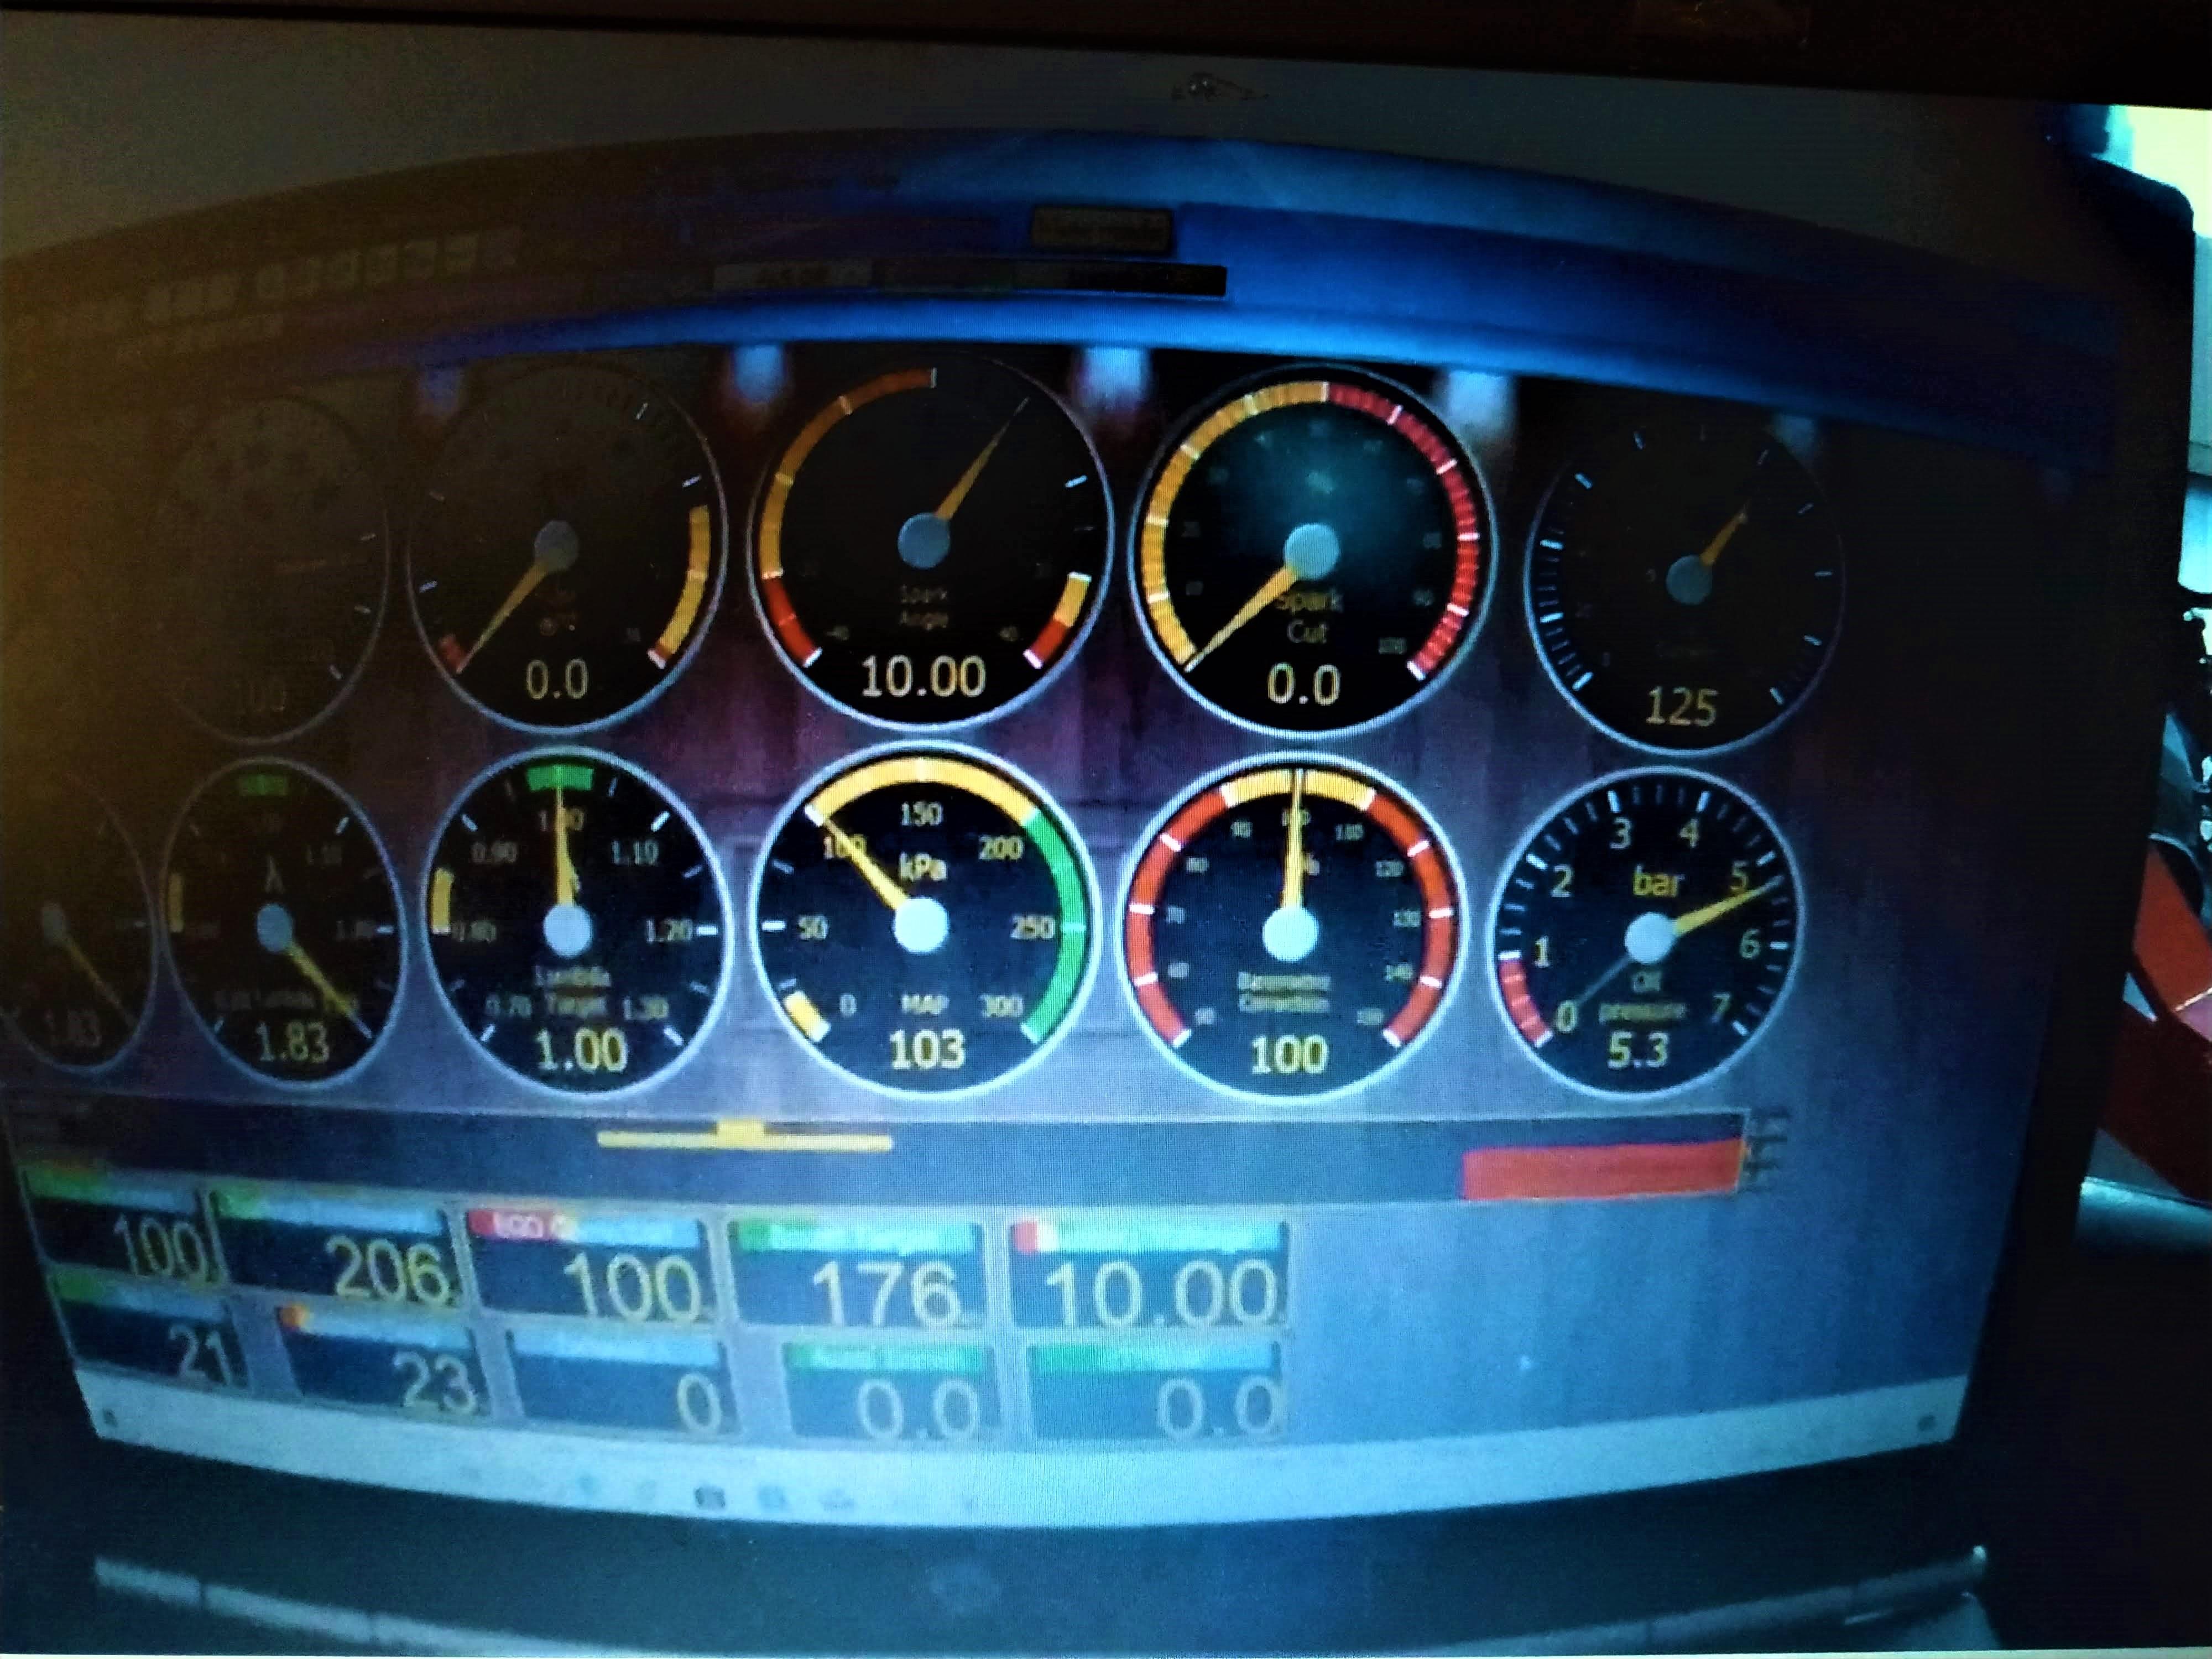 W201 V12 VEMS ECU configuration and oil pressure testing 1